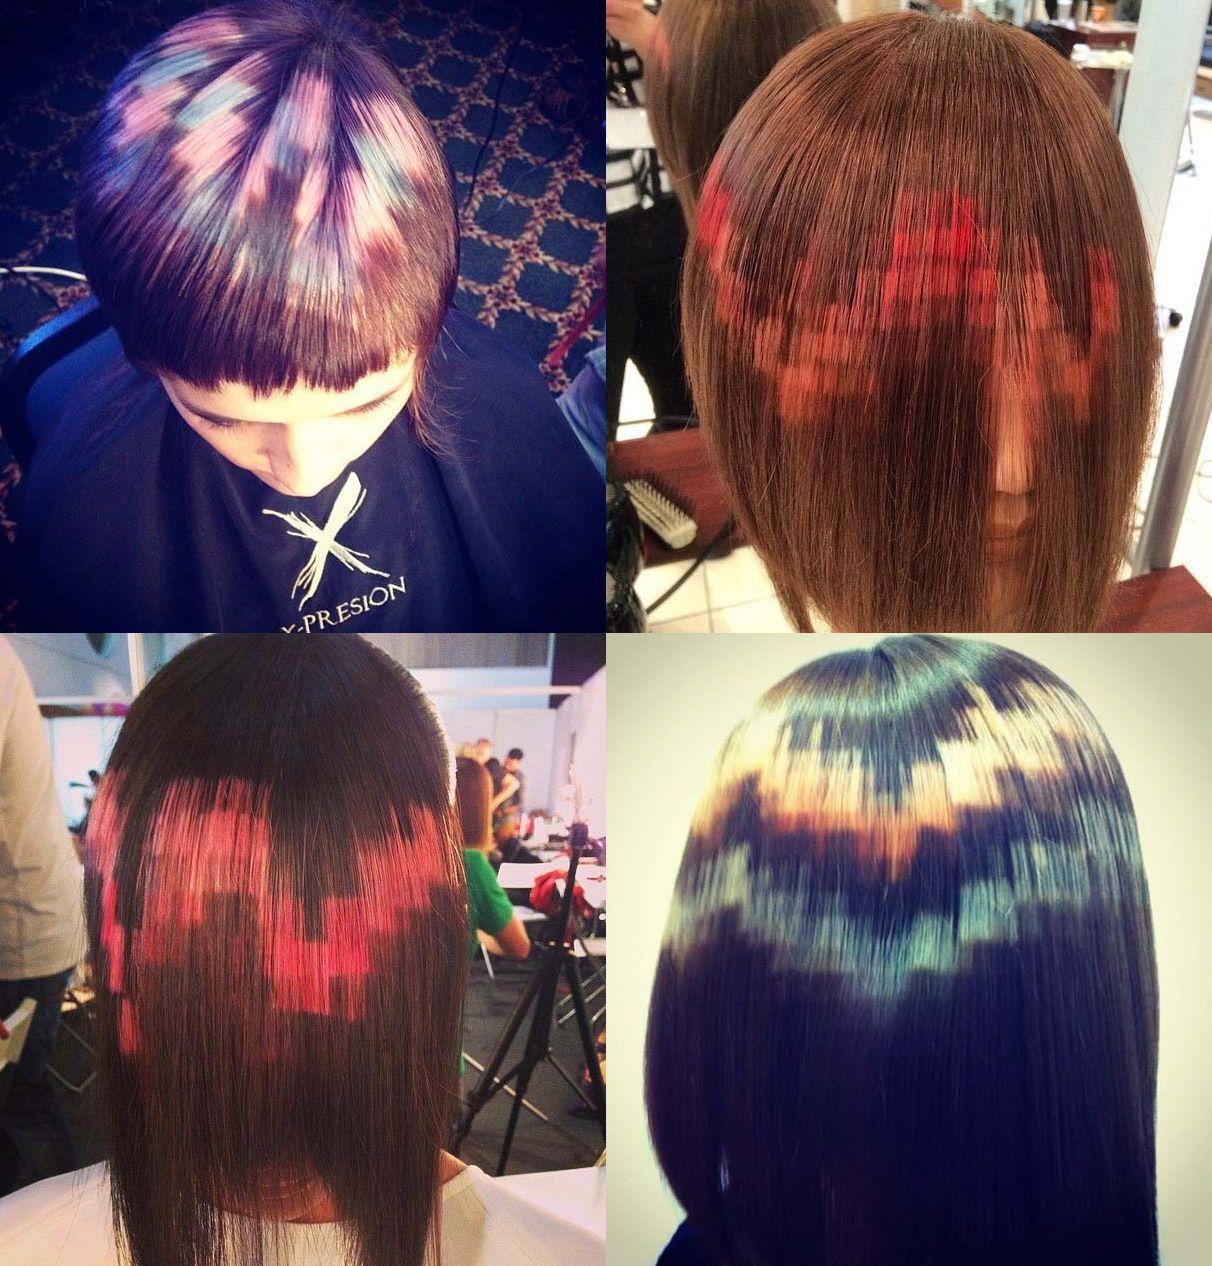 Hair That Looks Like Pixel Art Xpresionpixel Hair Trends 2015 Hair Trends Hair Color Techniques